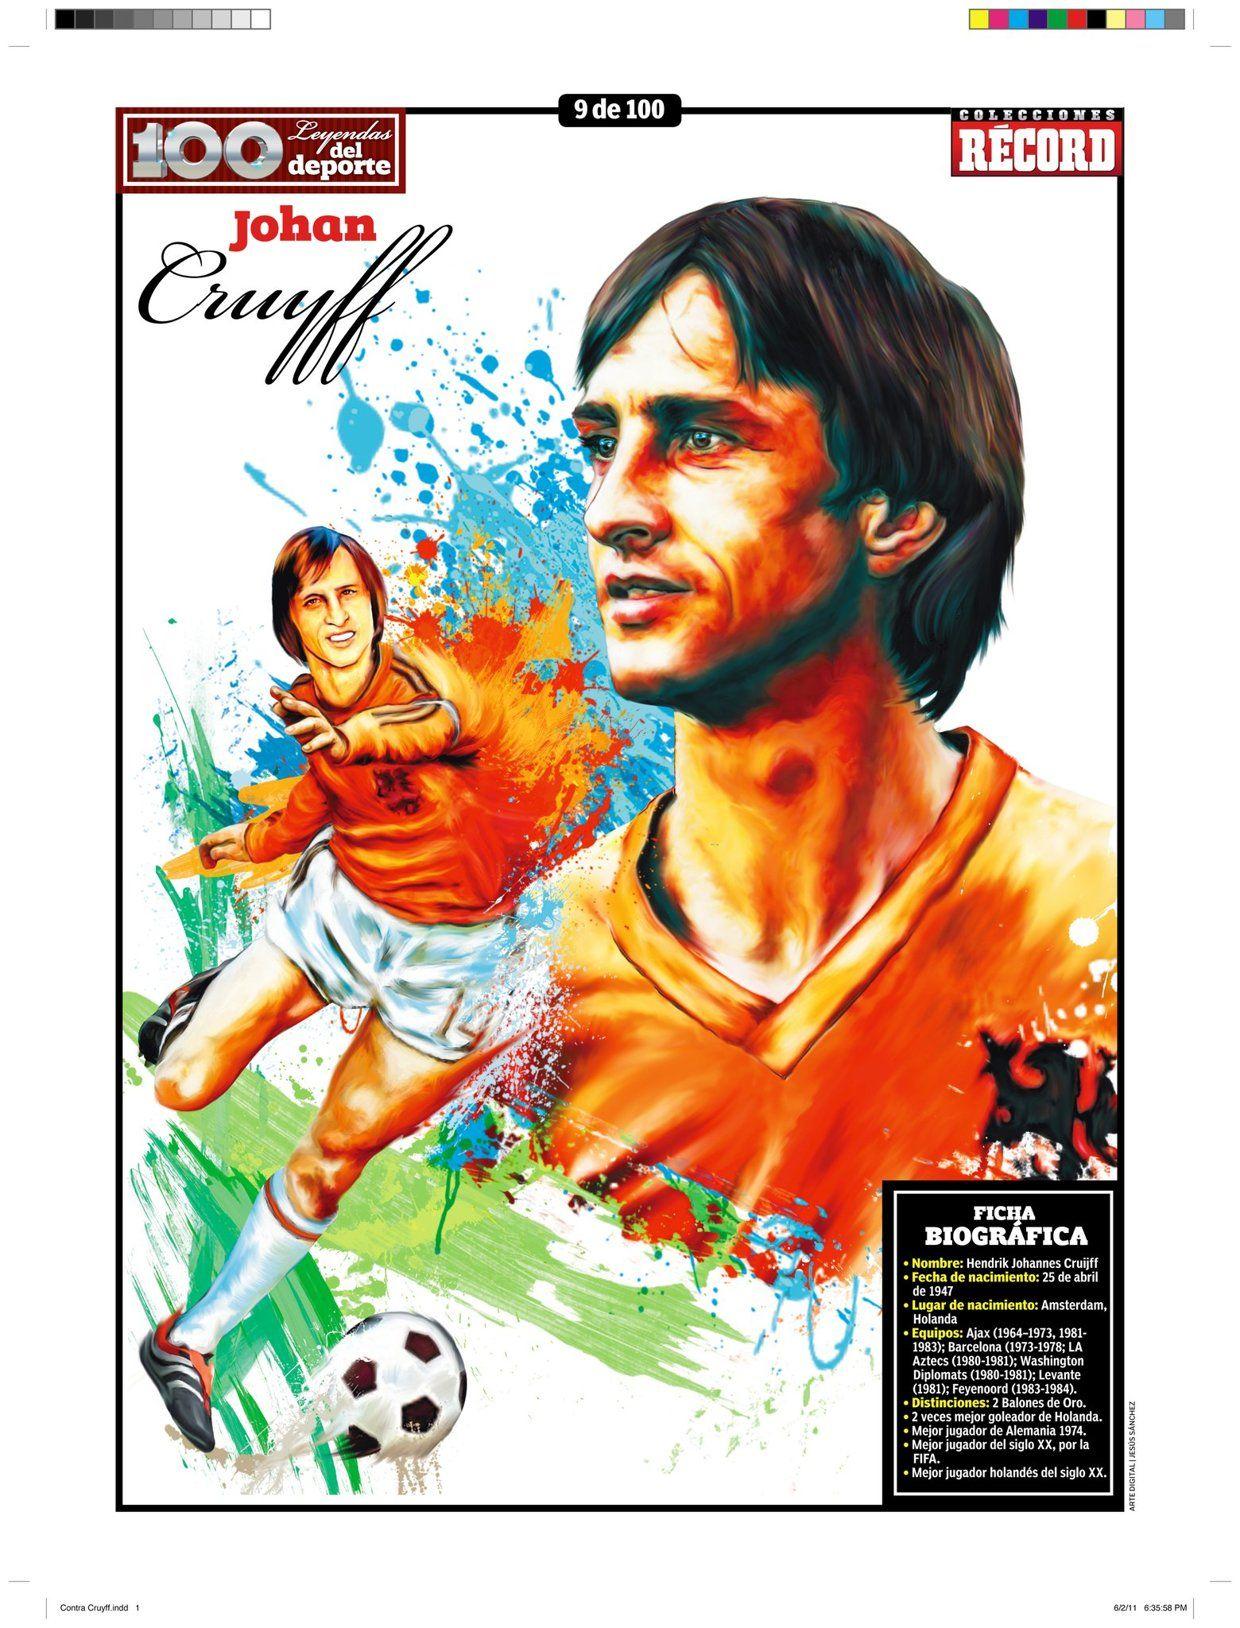 100 Leyendas Del Deporte 100 Sports Legends On Behance Football Lendas Do Futebol Futebol Arte Futebol Pelo Mundo